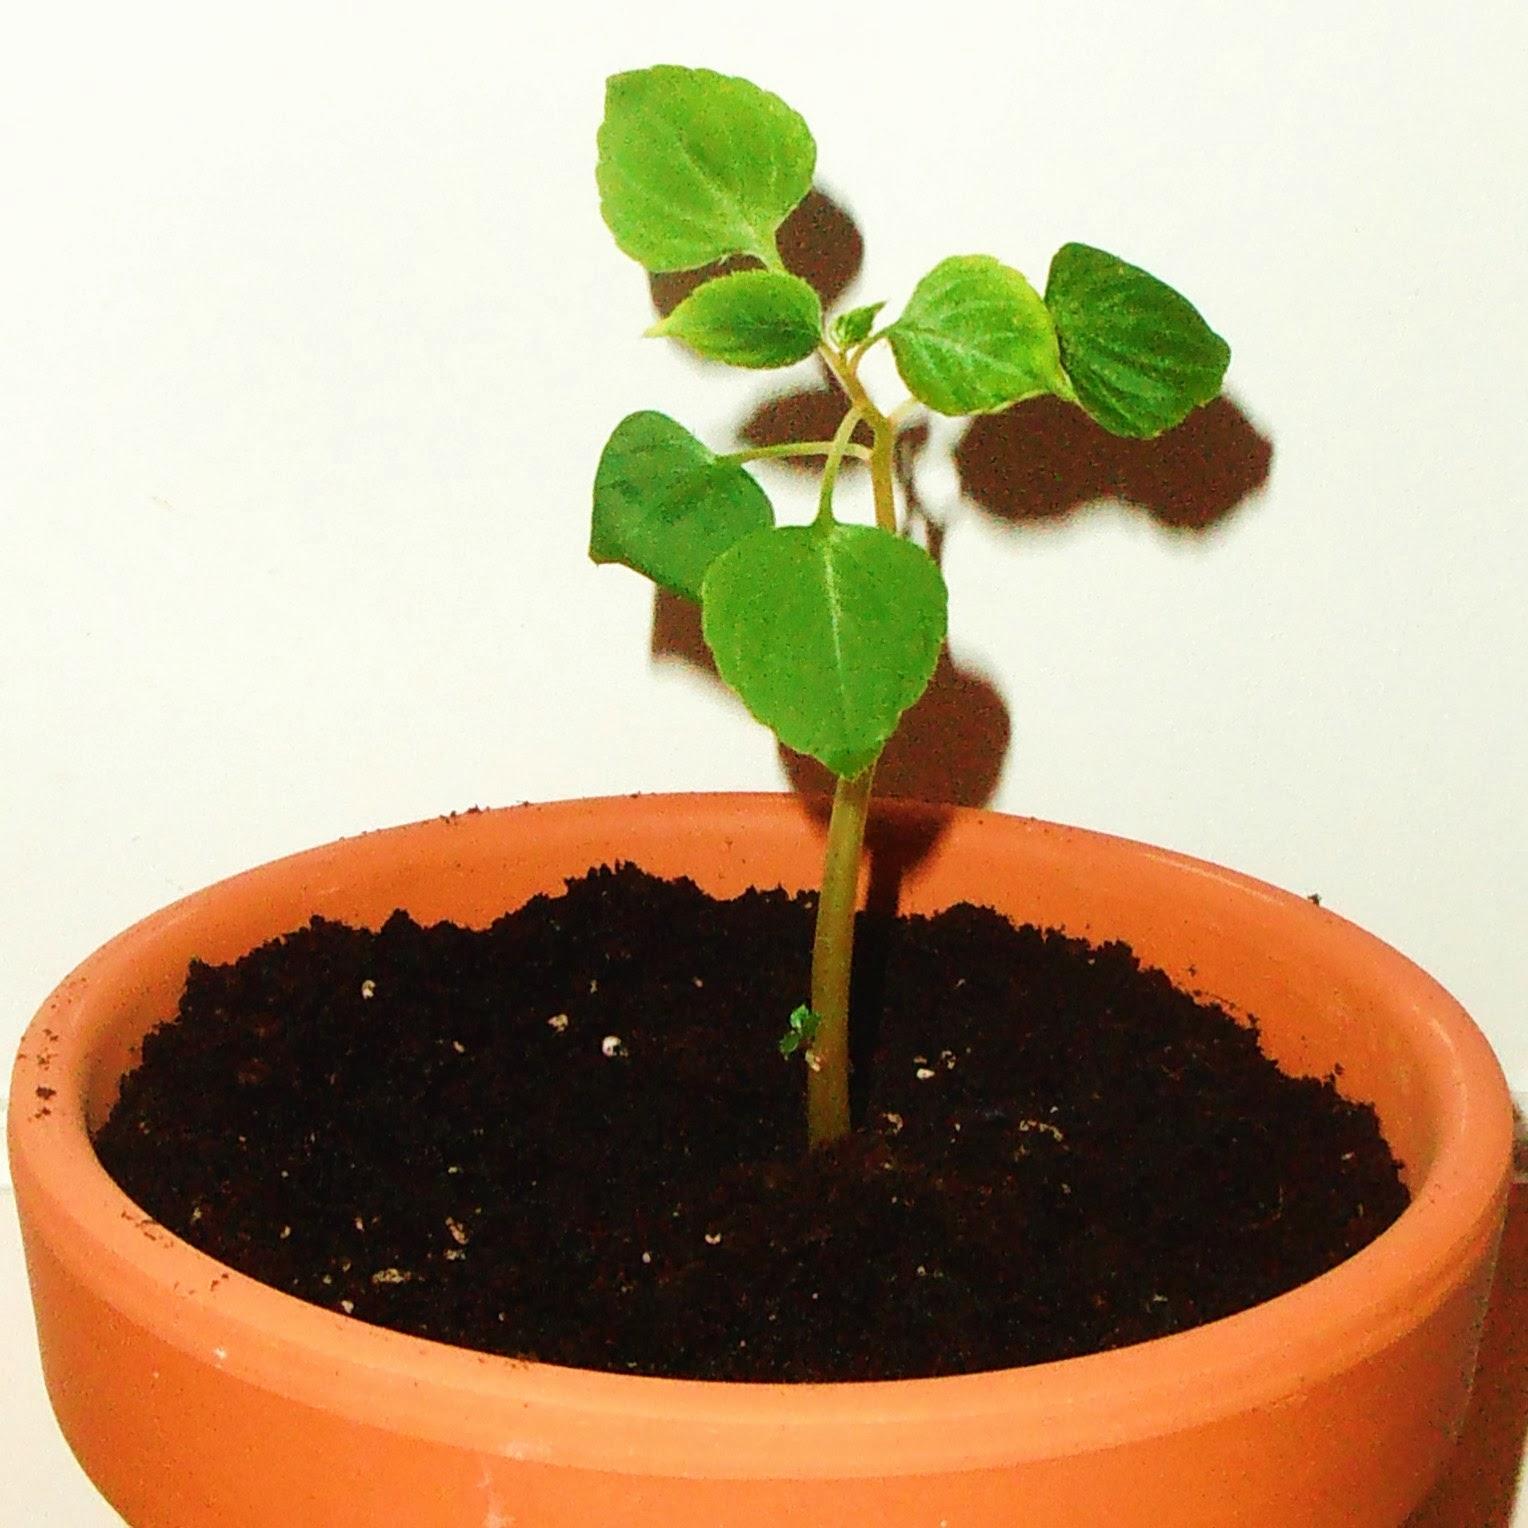 La ventana de javiruli plantas de interior 23 esqueje de alegr a del hogar impatiens - Planta alegria del hogar ...